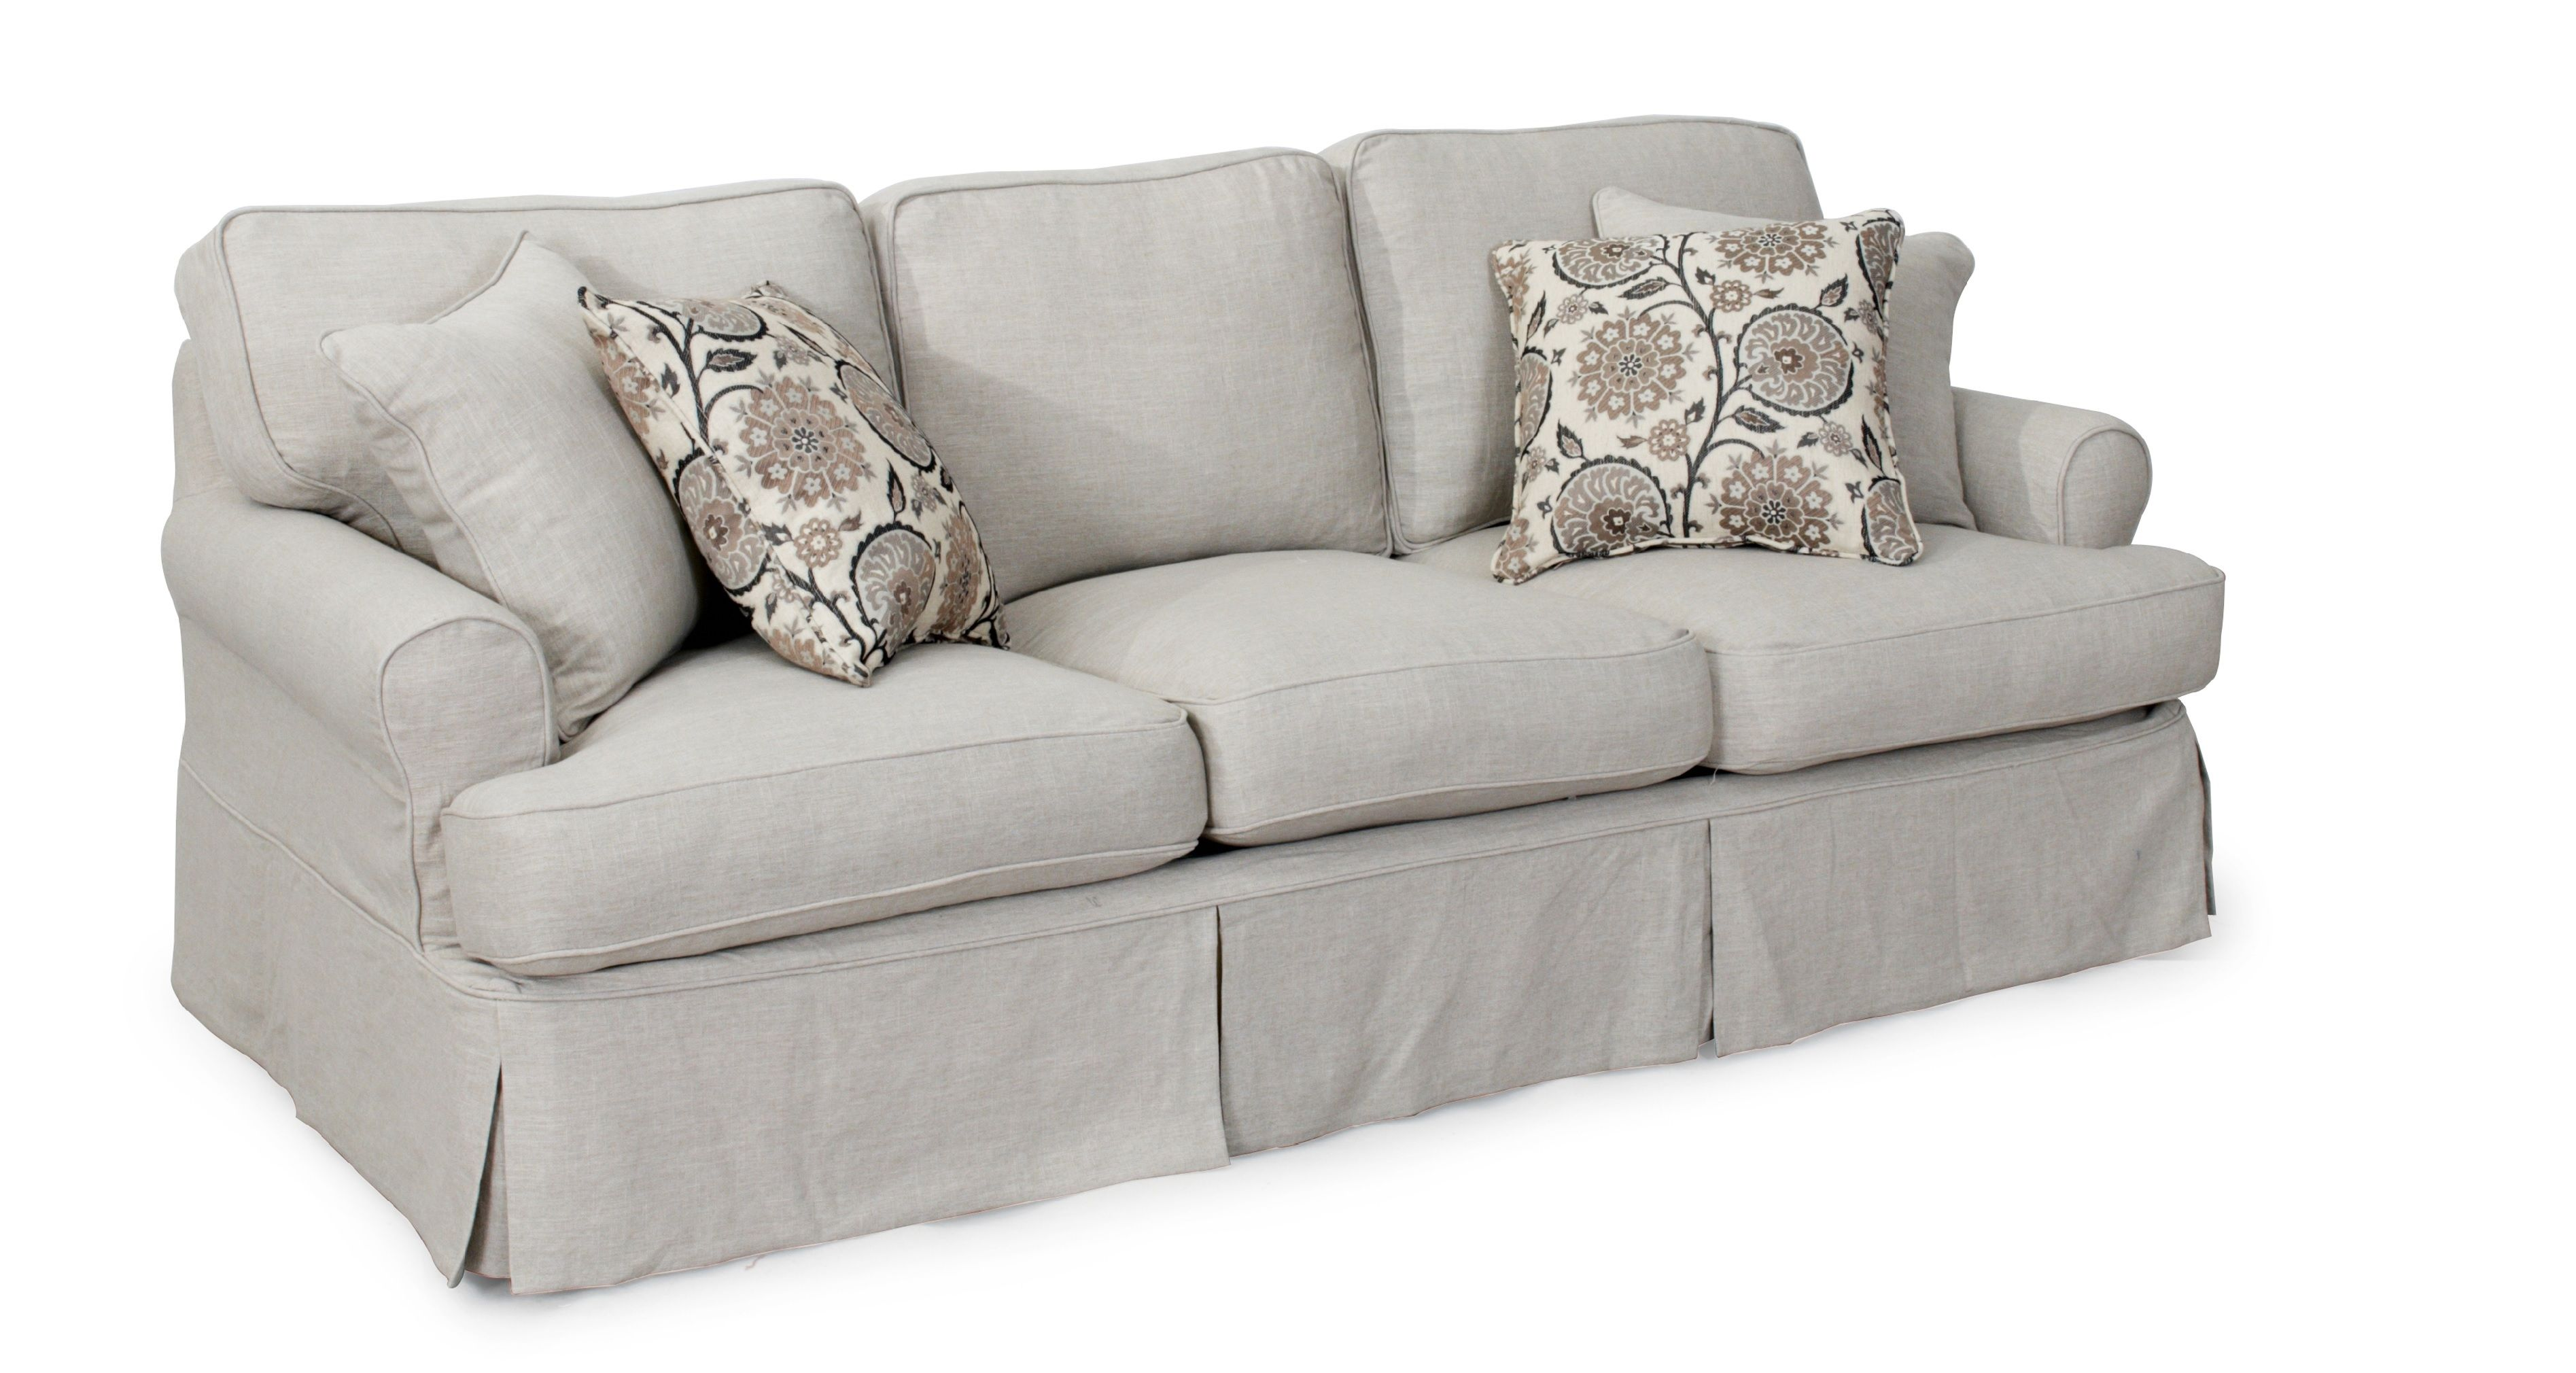 Cushions On Sofa Slipcovers